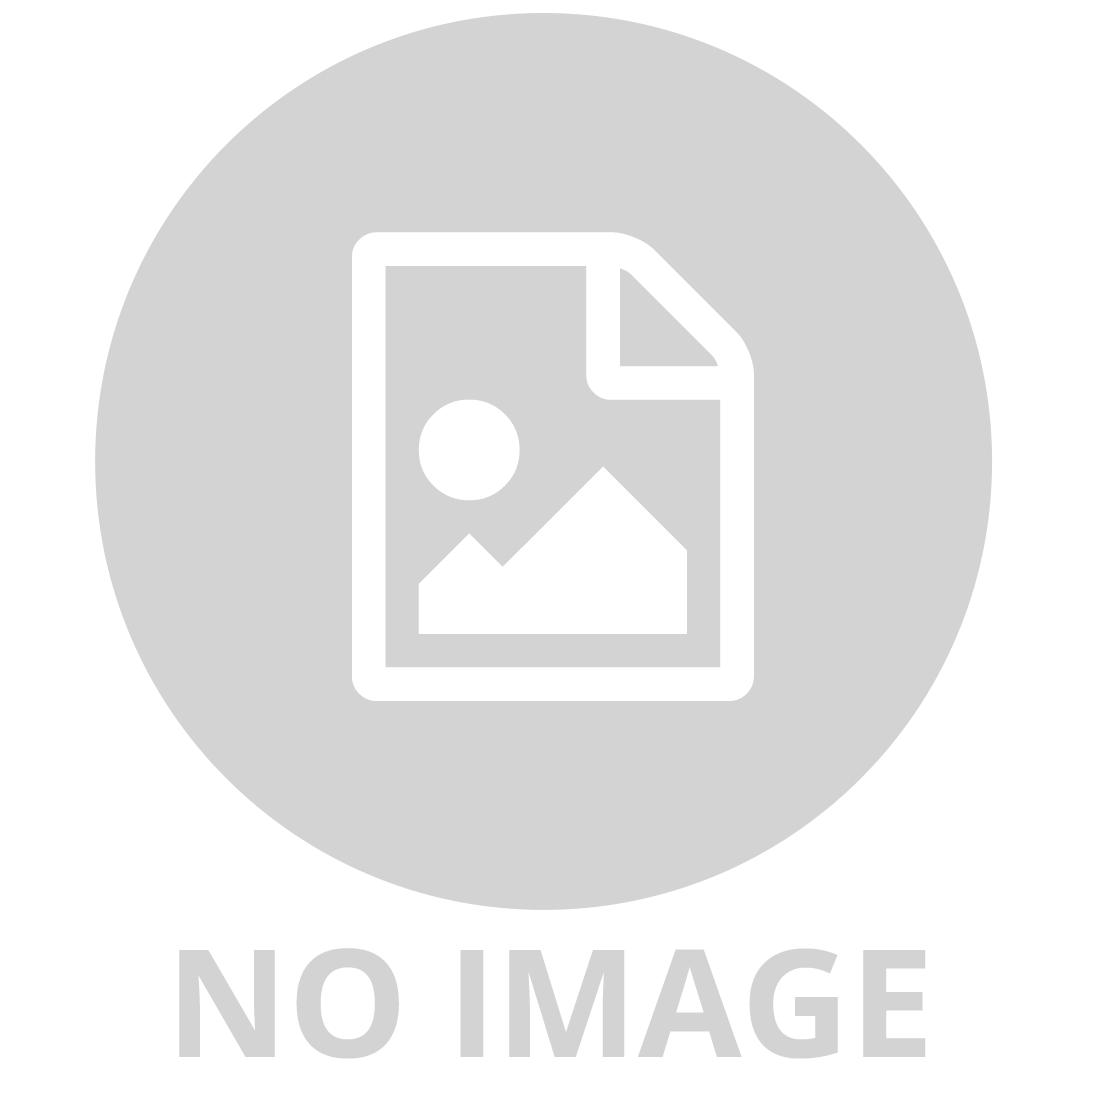 TAMIYA TS-8 ITALIAN RED SPRAY PAINT FOR PLASTICS